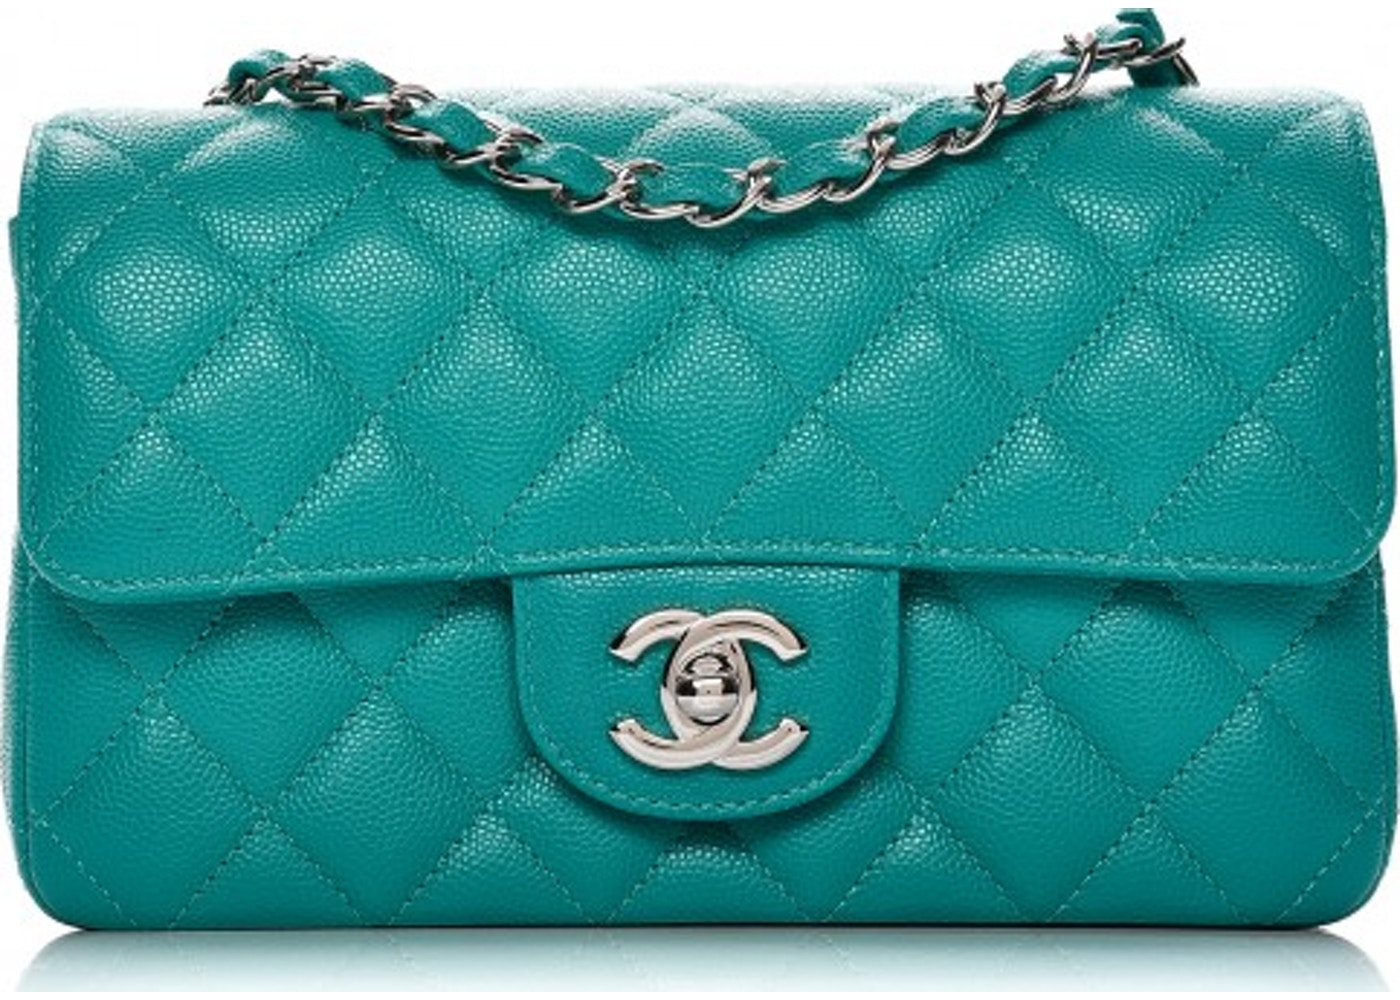 9b8034753286 Chanel Rectangular Flap Diamond Quilted Mini Turquoise